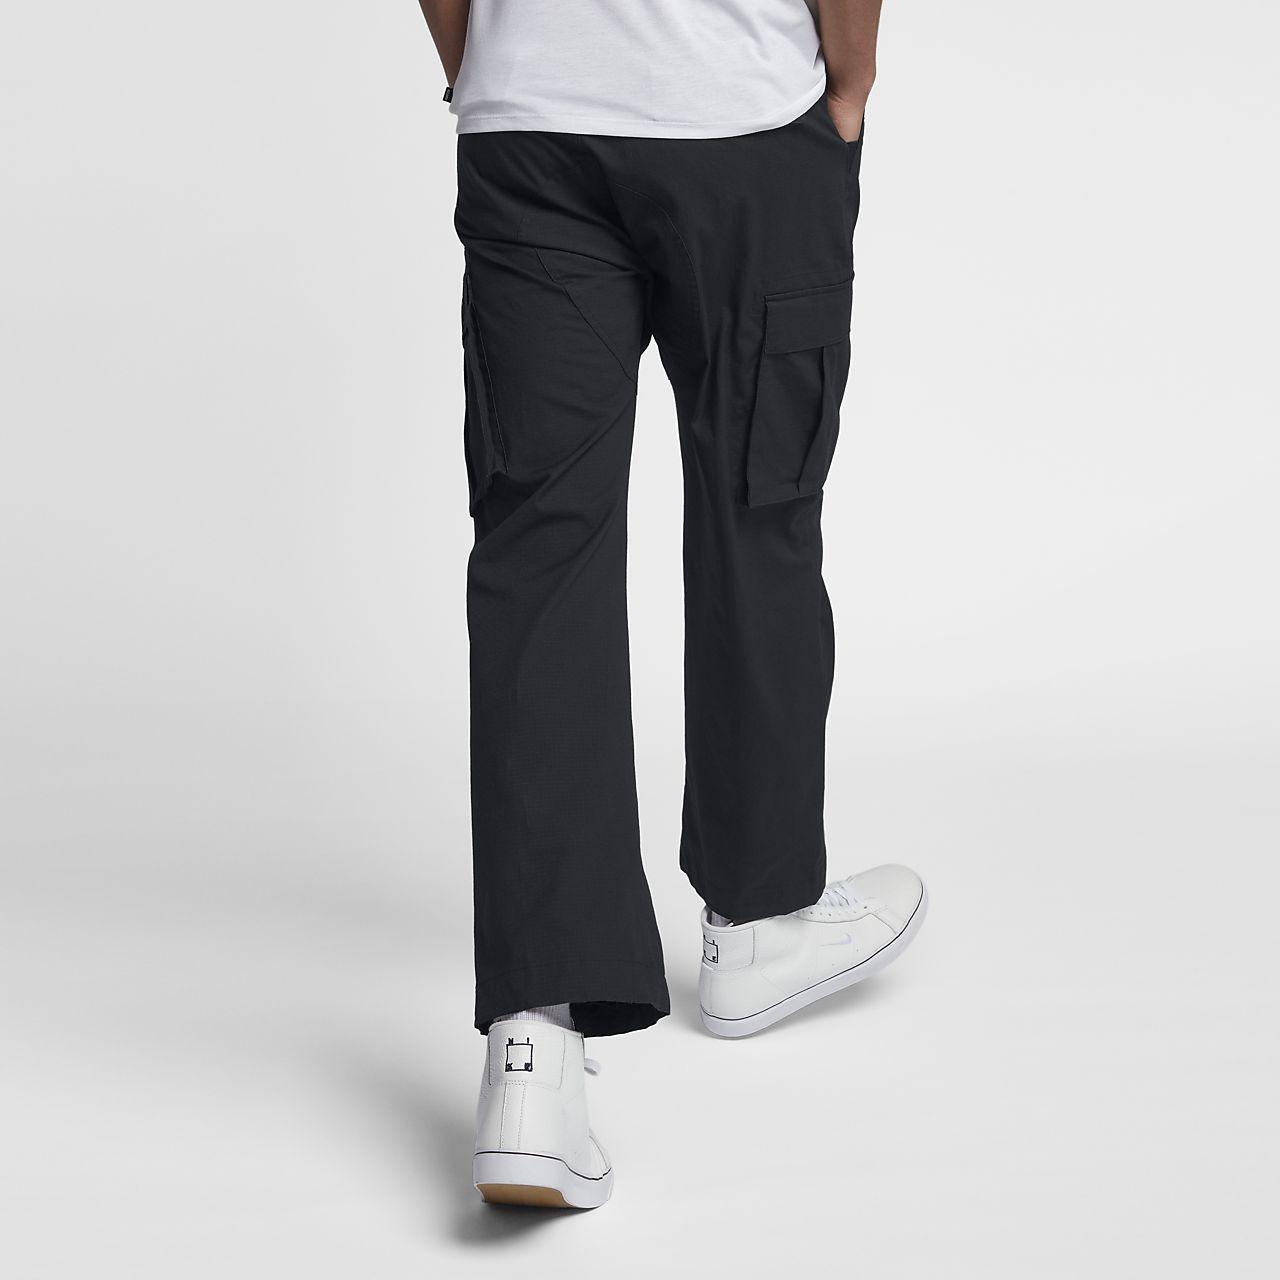 0faaf7d5b5e1 Nike SB Flex FTM Men s Skate Cargo Trousers. Nike.com GB